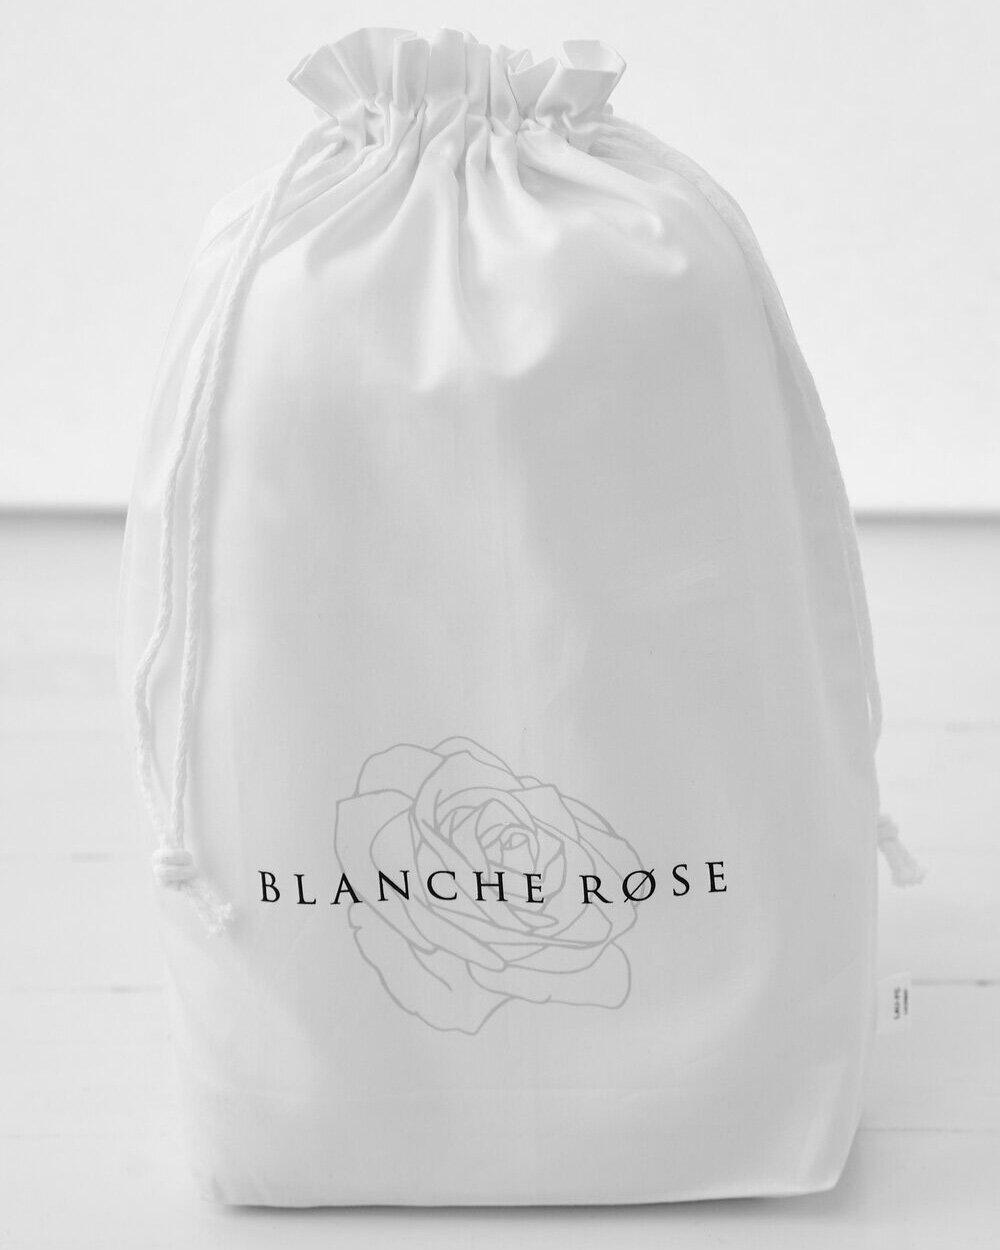 Blanche-Rose-Pillow-Cases-04.jpg